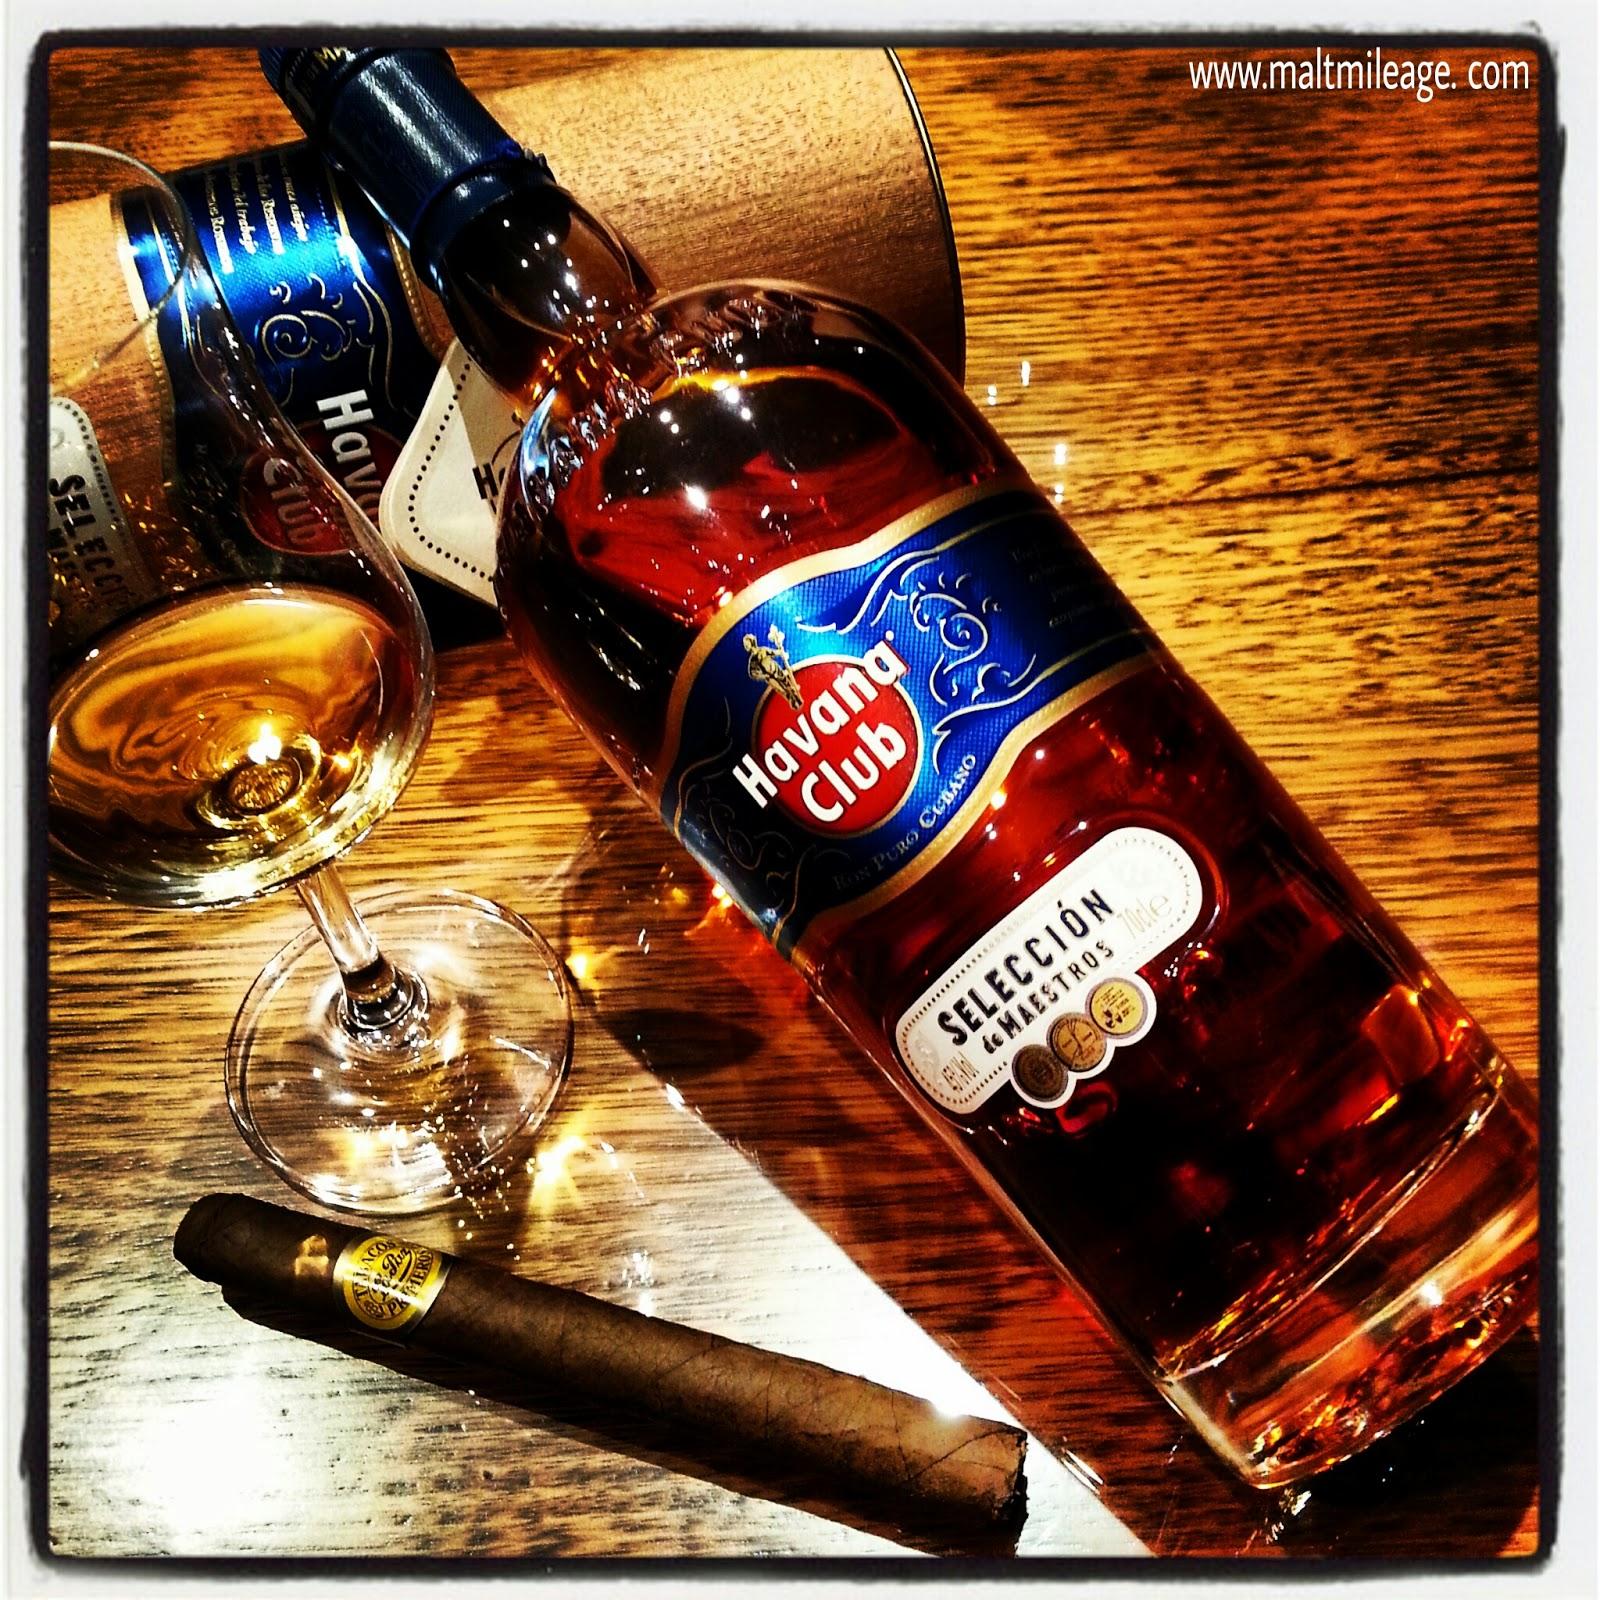 Malt Mileage Whisky Amp Spirit Reviews Havana Club